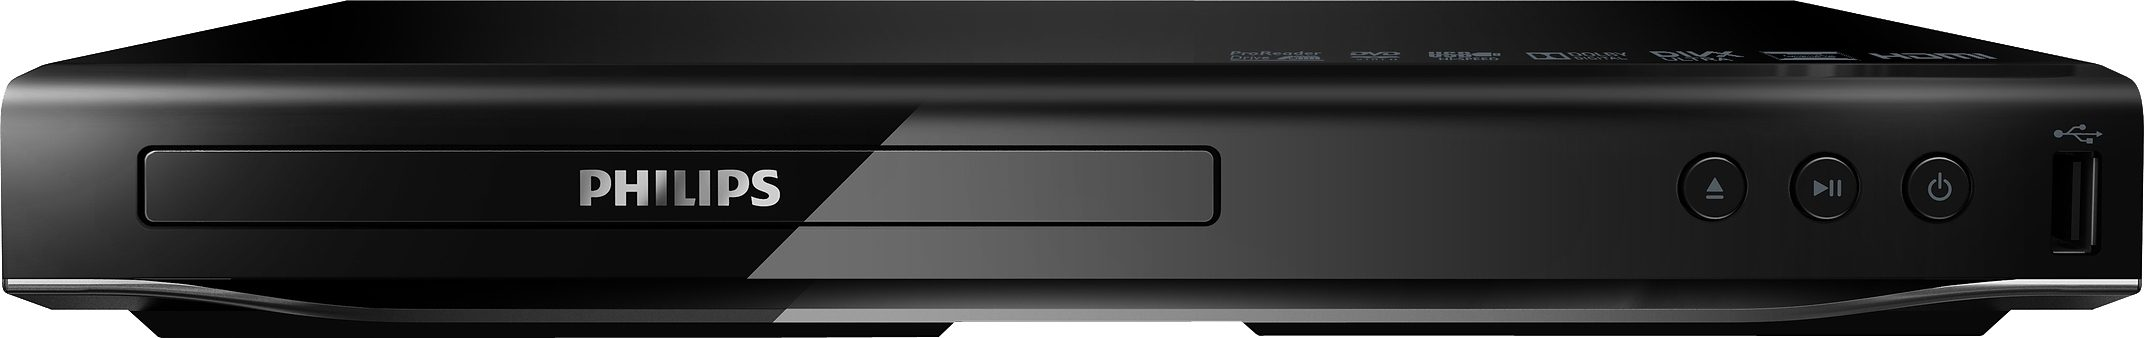 Philips DVD-Player DVP2880/12